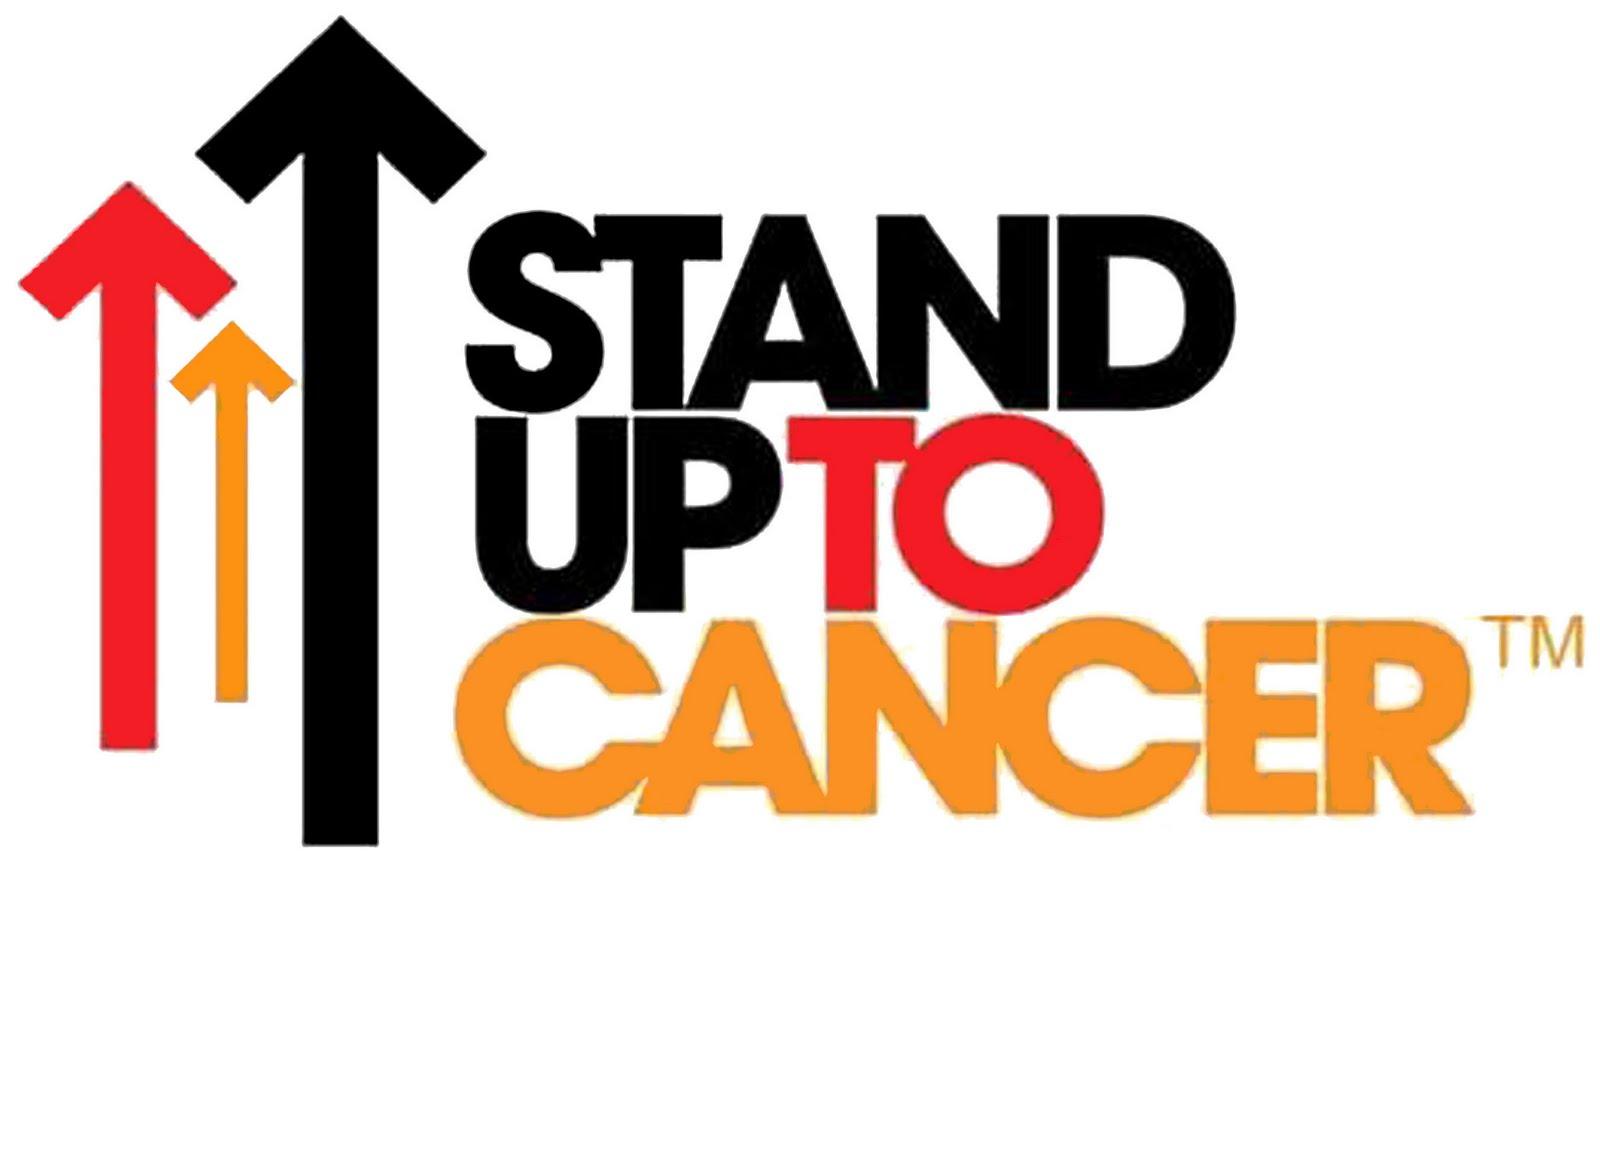 http://2.bp.blogspot.com/_hK_OOhO9A1M/TIj59_YkEXI/AAAAAAAAG1k/6OJRoyZVk90/s1600/STAND-UP-TO-CANCER-.jpg